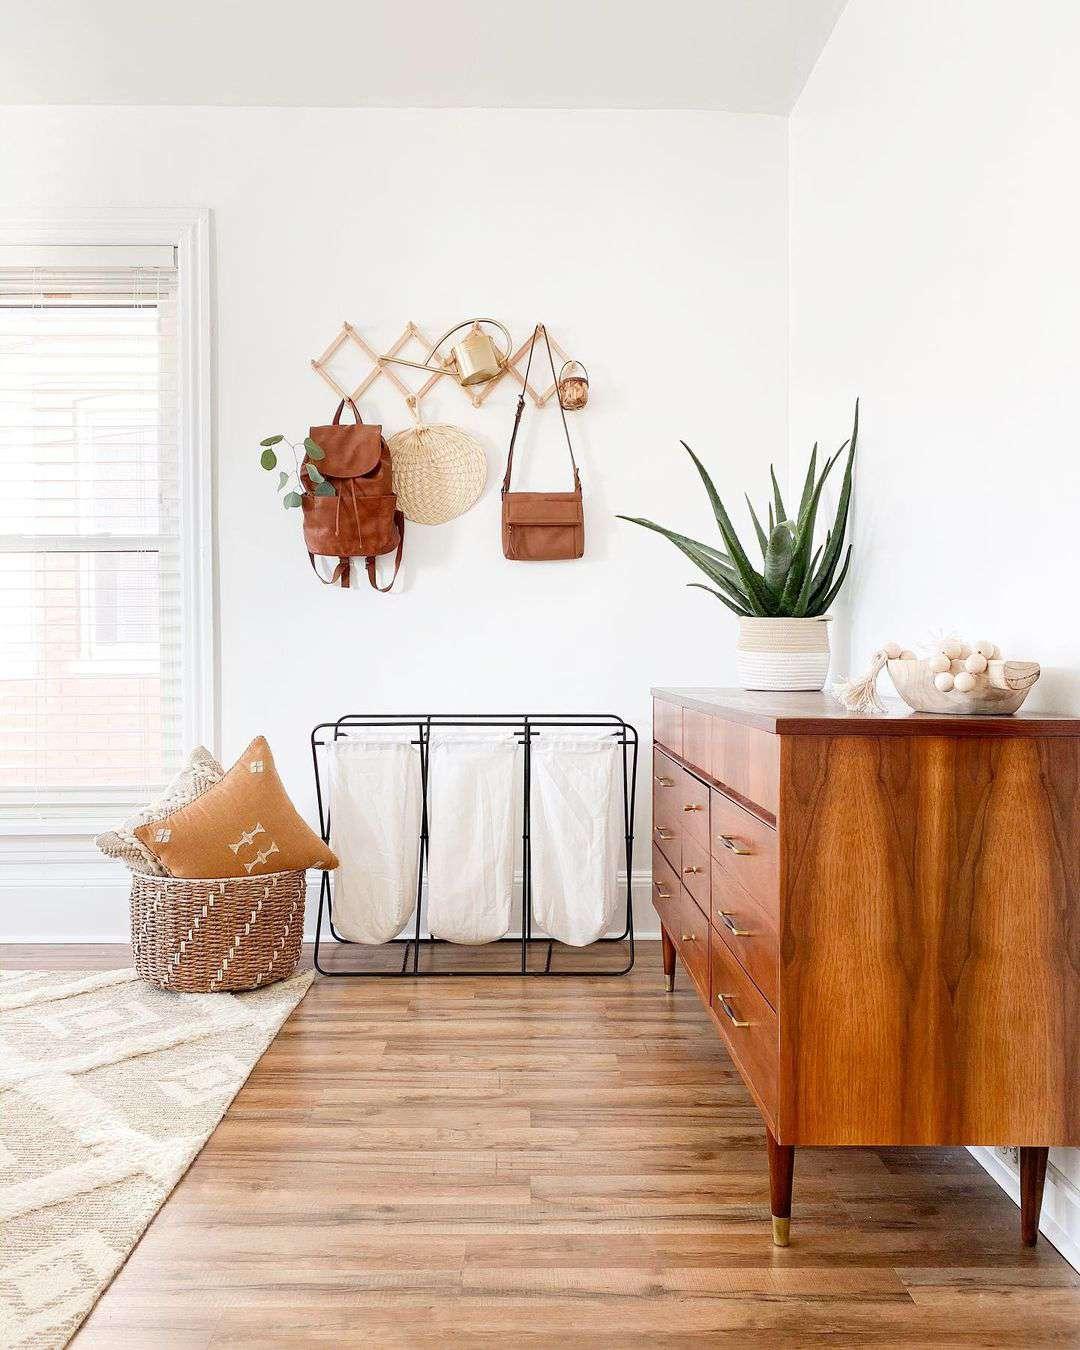 Aloe vera on a dresser